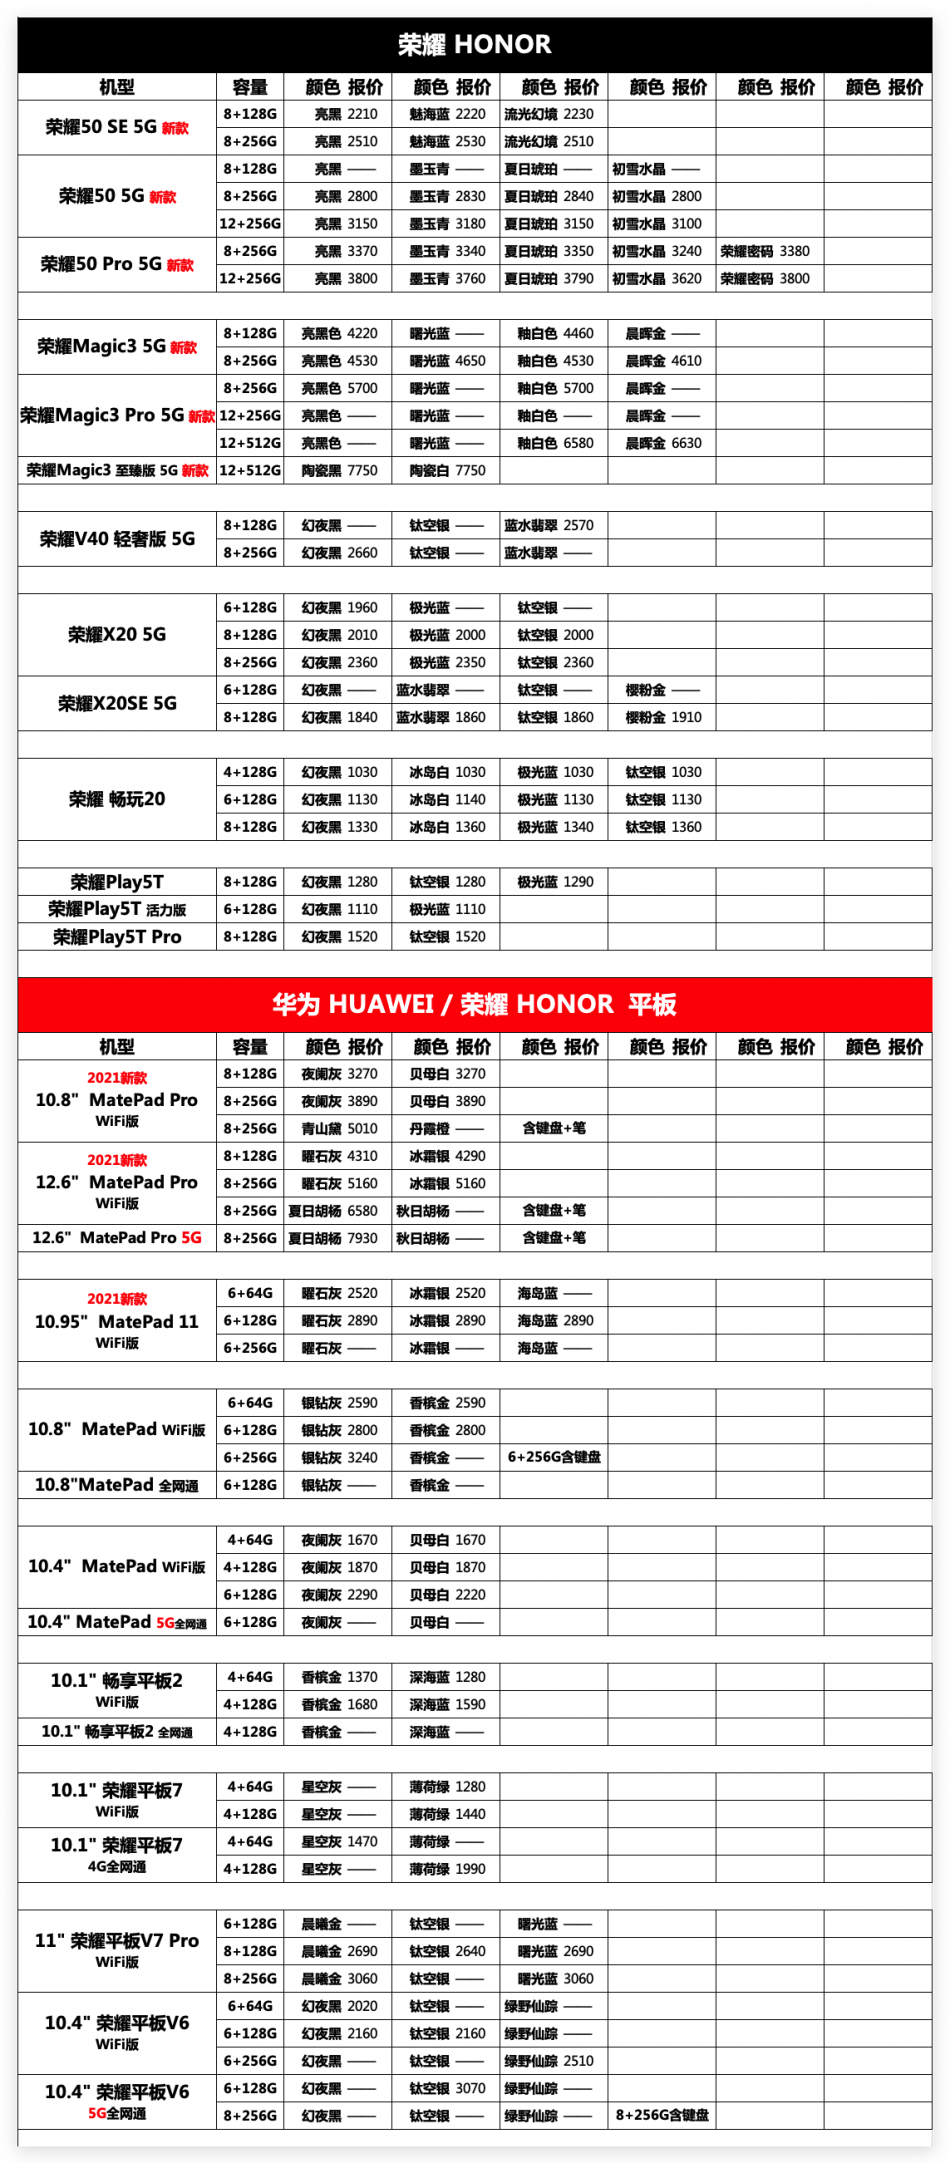 Xnip2021-09-12_15-19-35.png